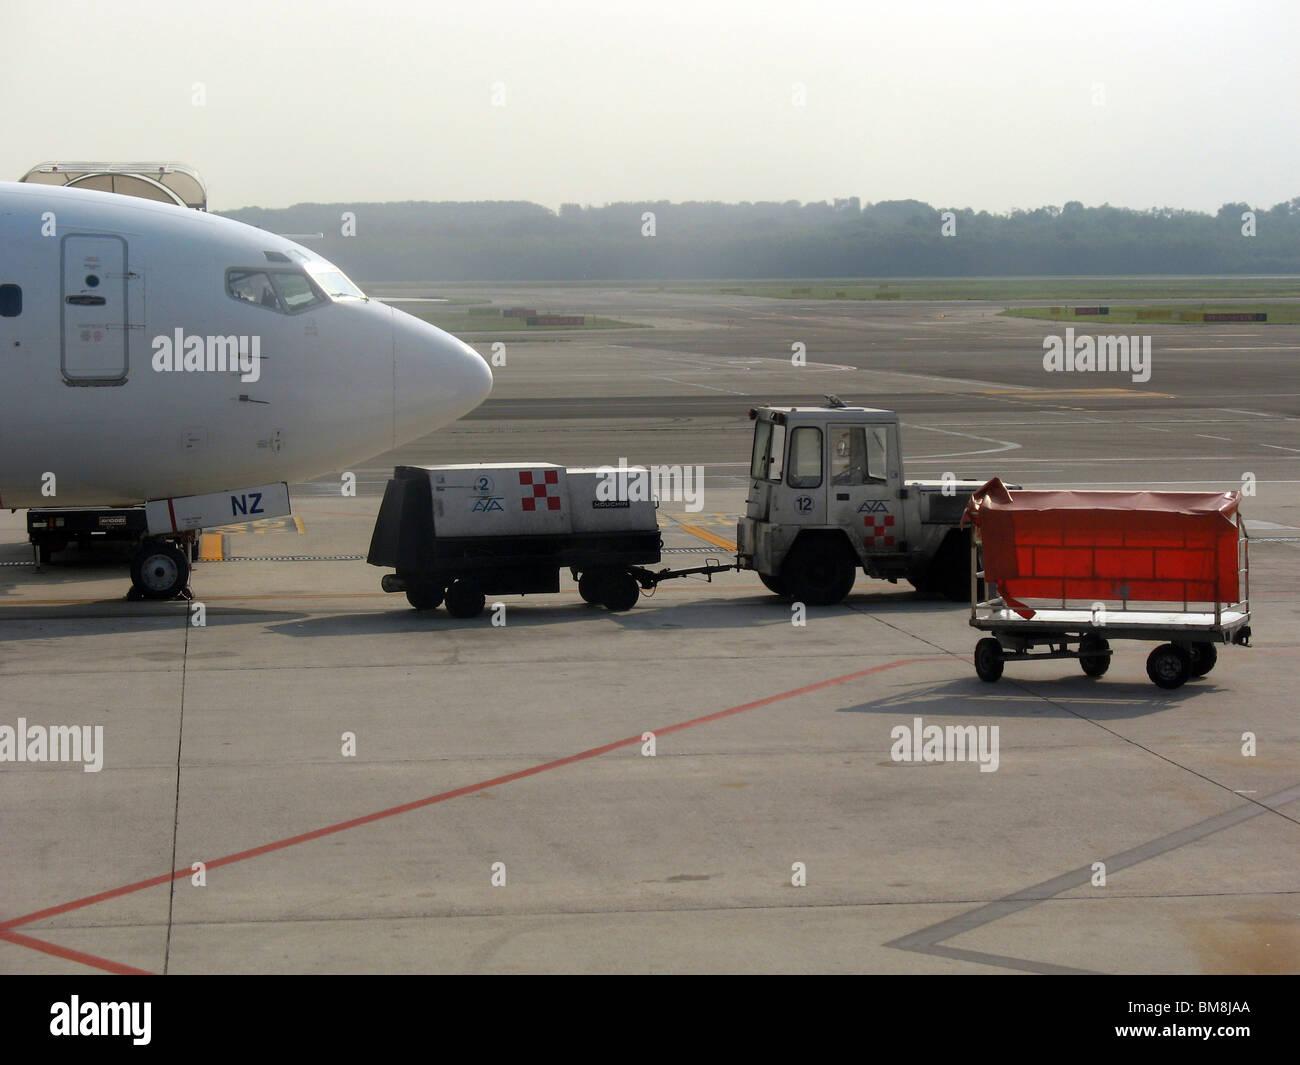 Italy, Milan Milano Malpensa Airport (MXP) - Stock Image